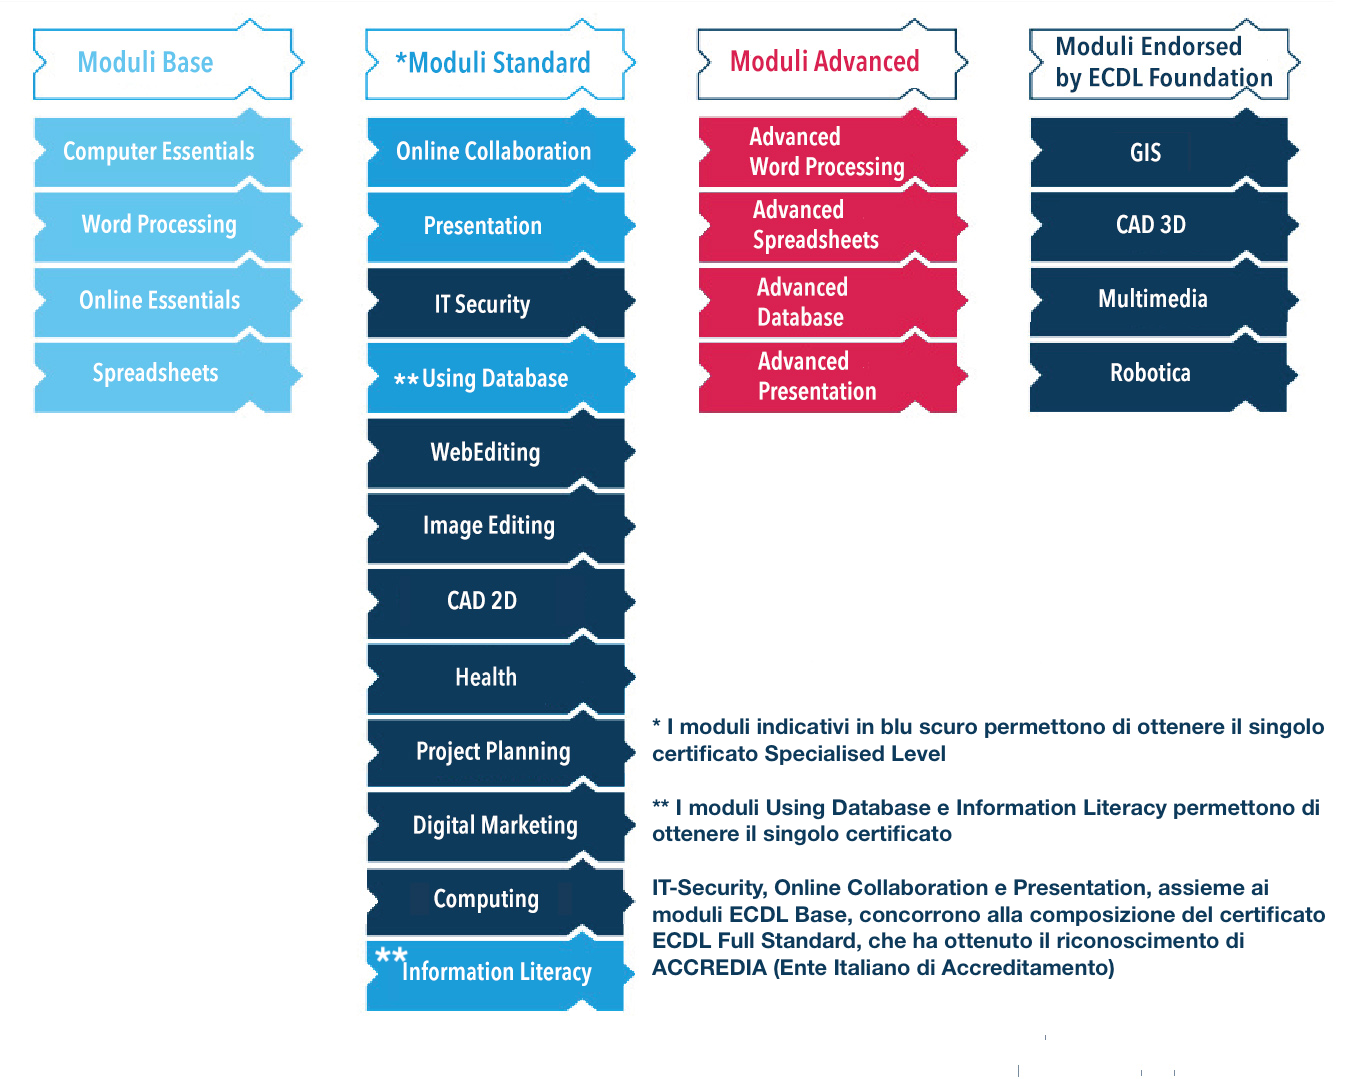 Moduli e certificazioni ECDL